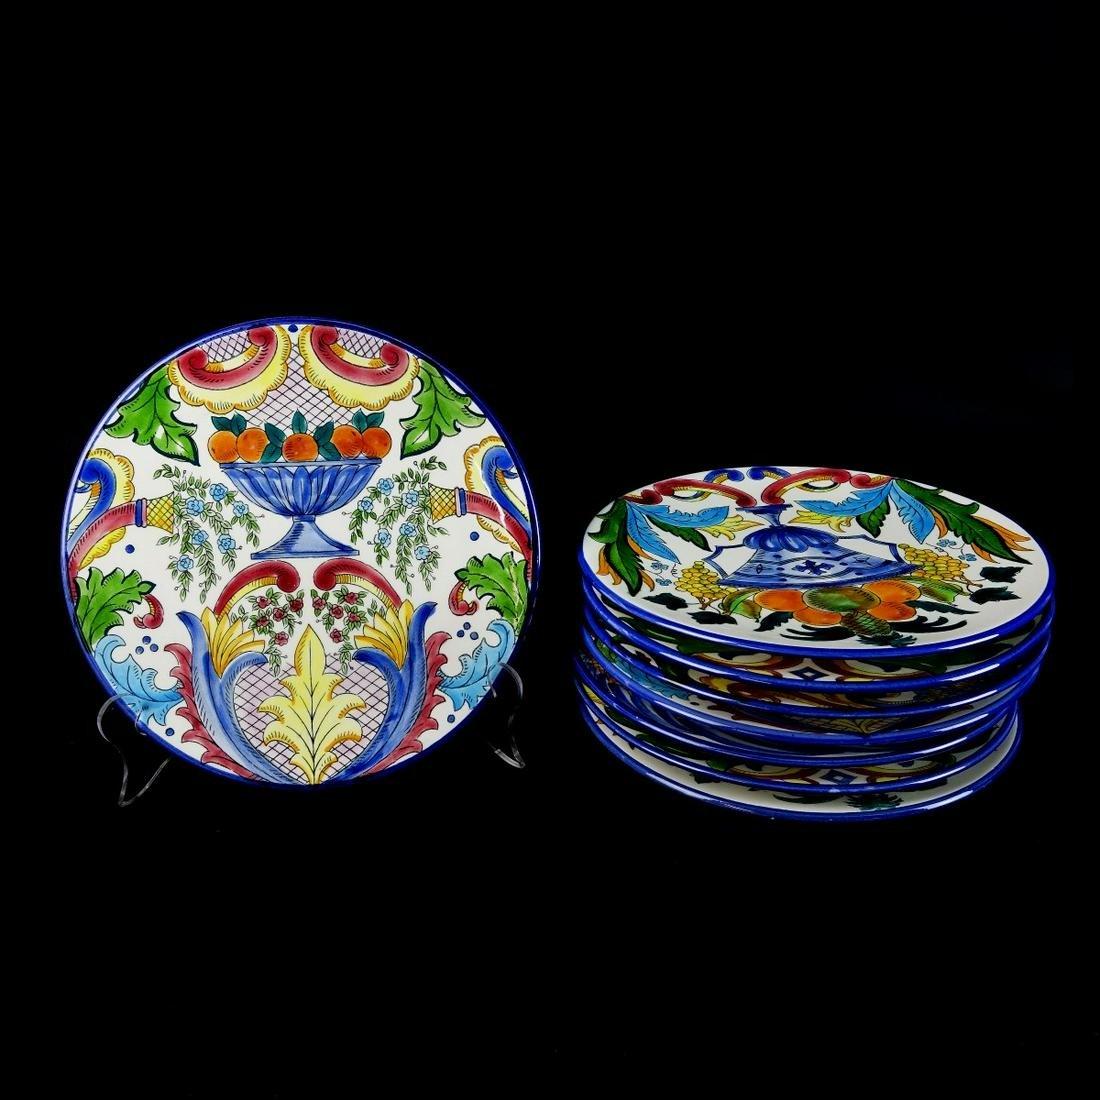 Eight (8) Mac' B French Faience Porcelain Plates